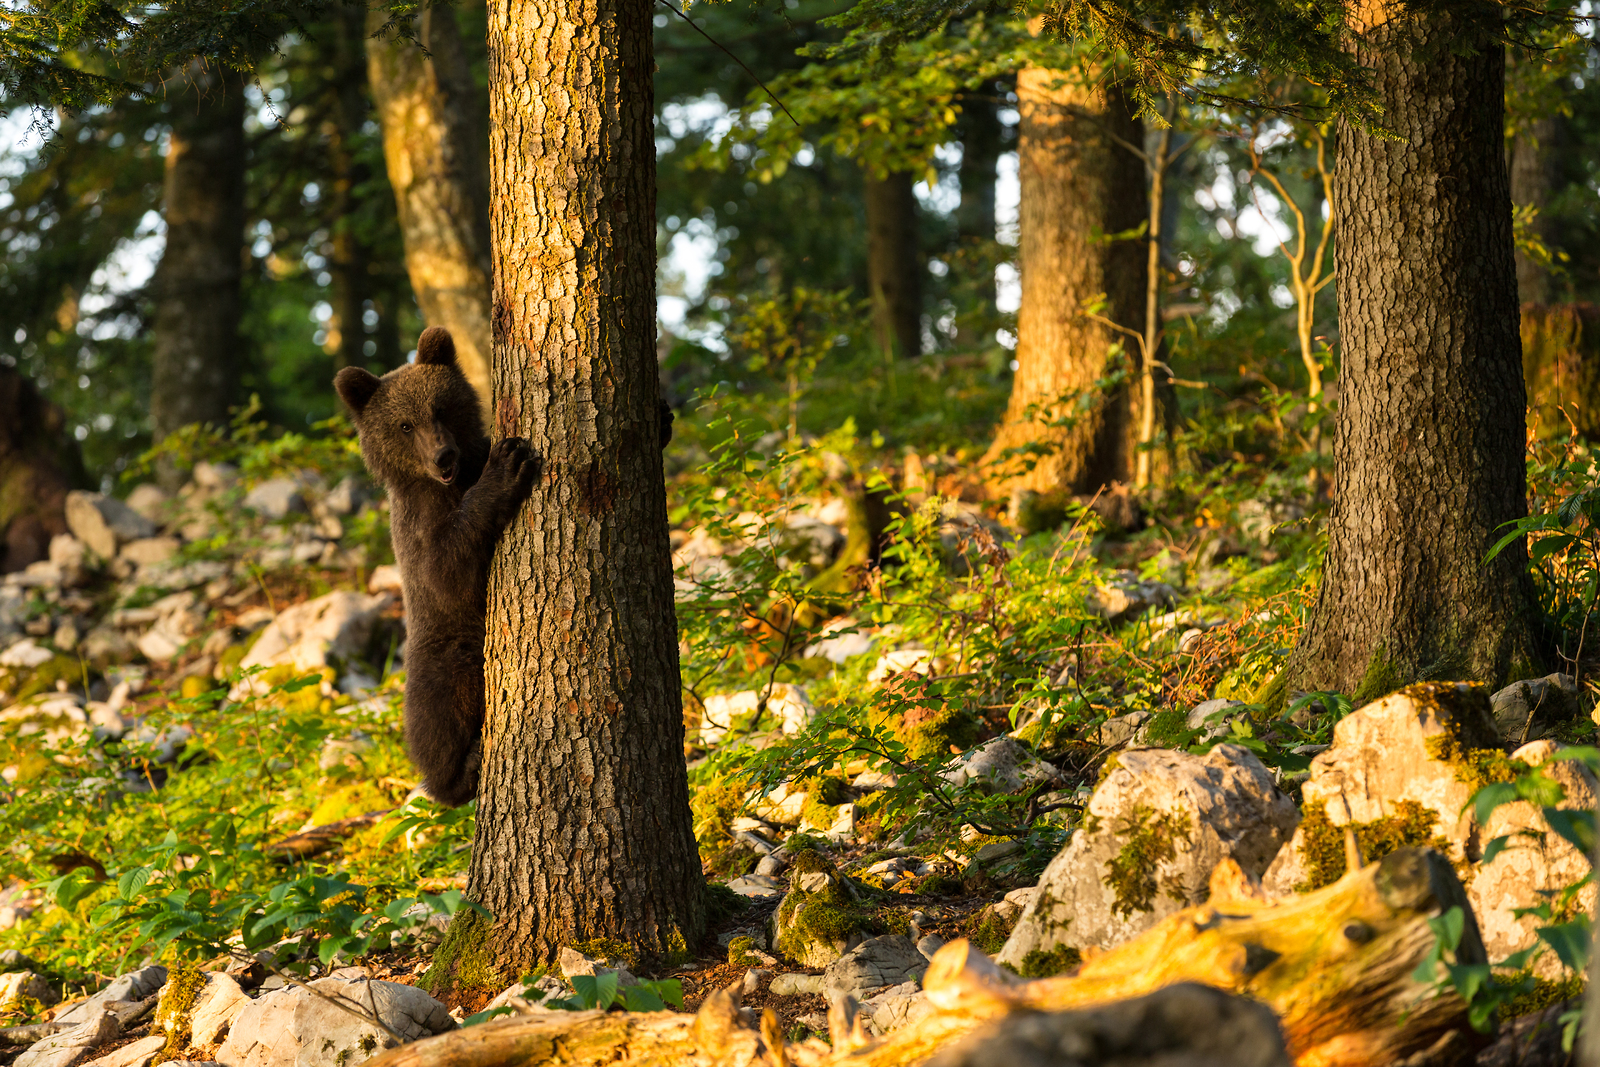 Bear-watching holidays in Slovenia